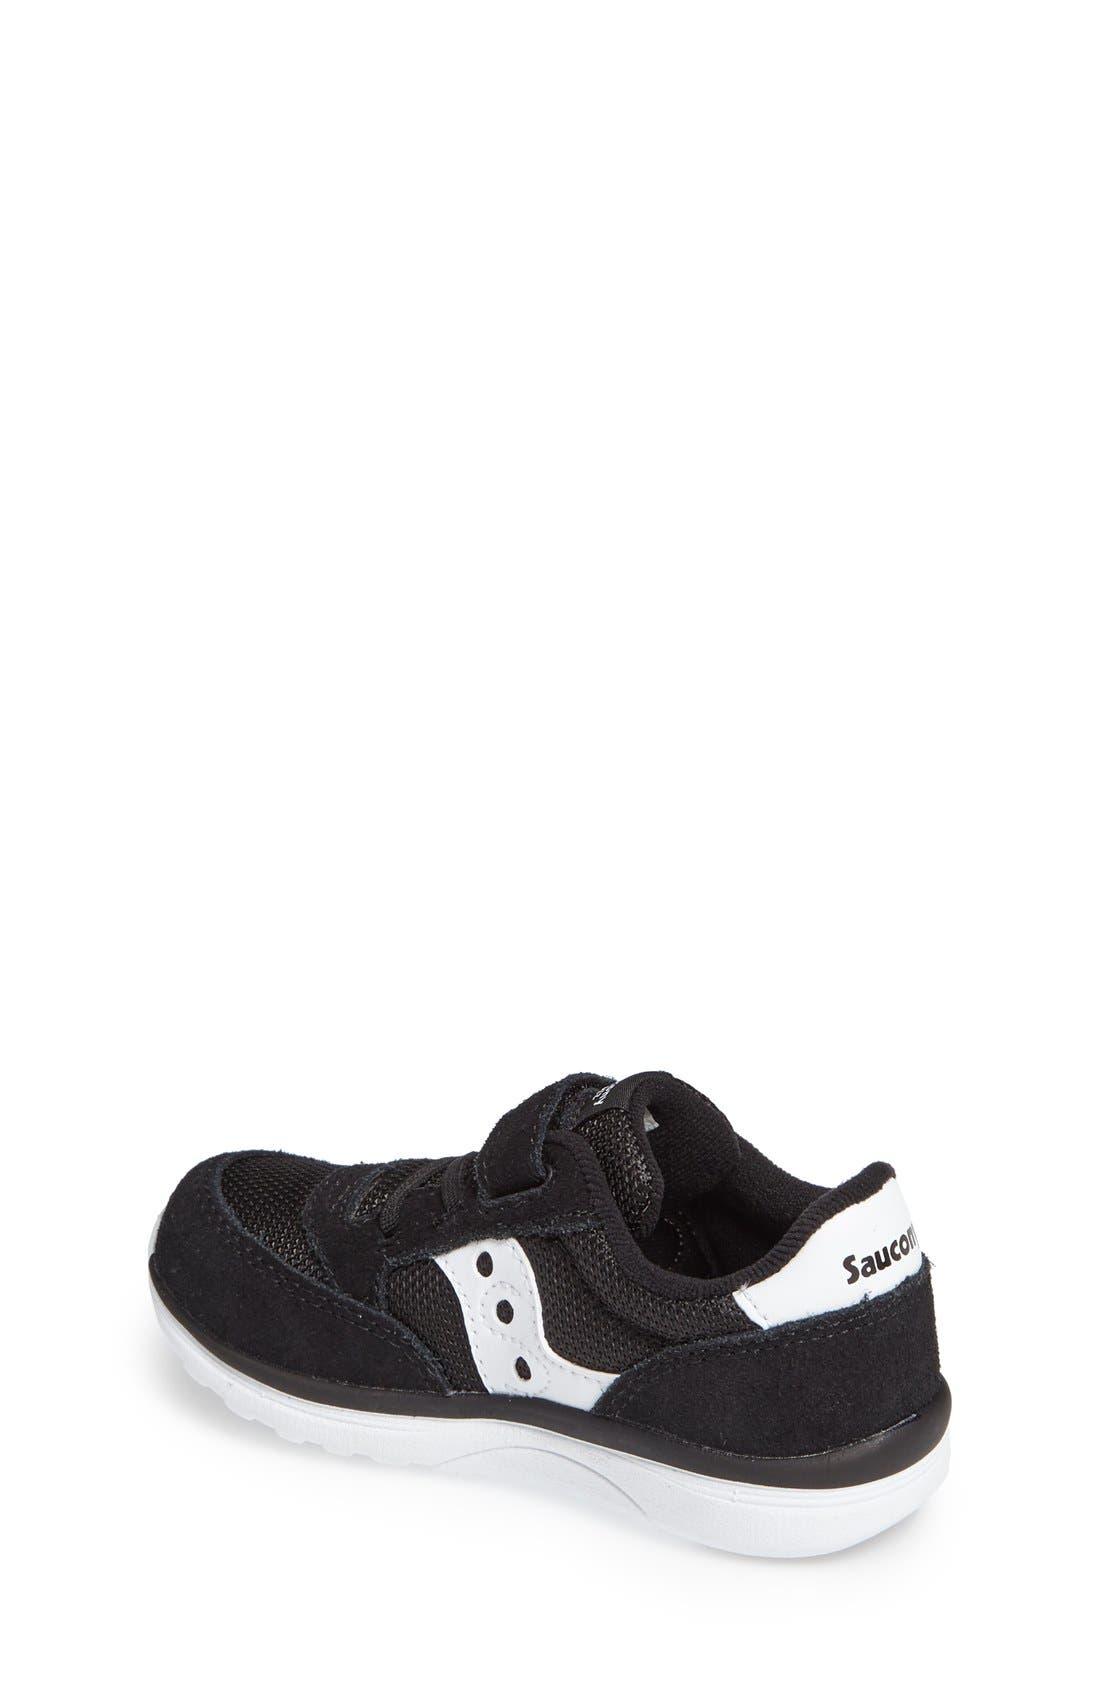 'Baby Jazz - Lite' Sneaker,                             Alternate thumbnail 2, color,                             Black